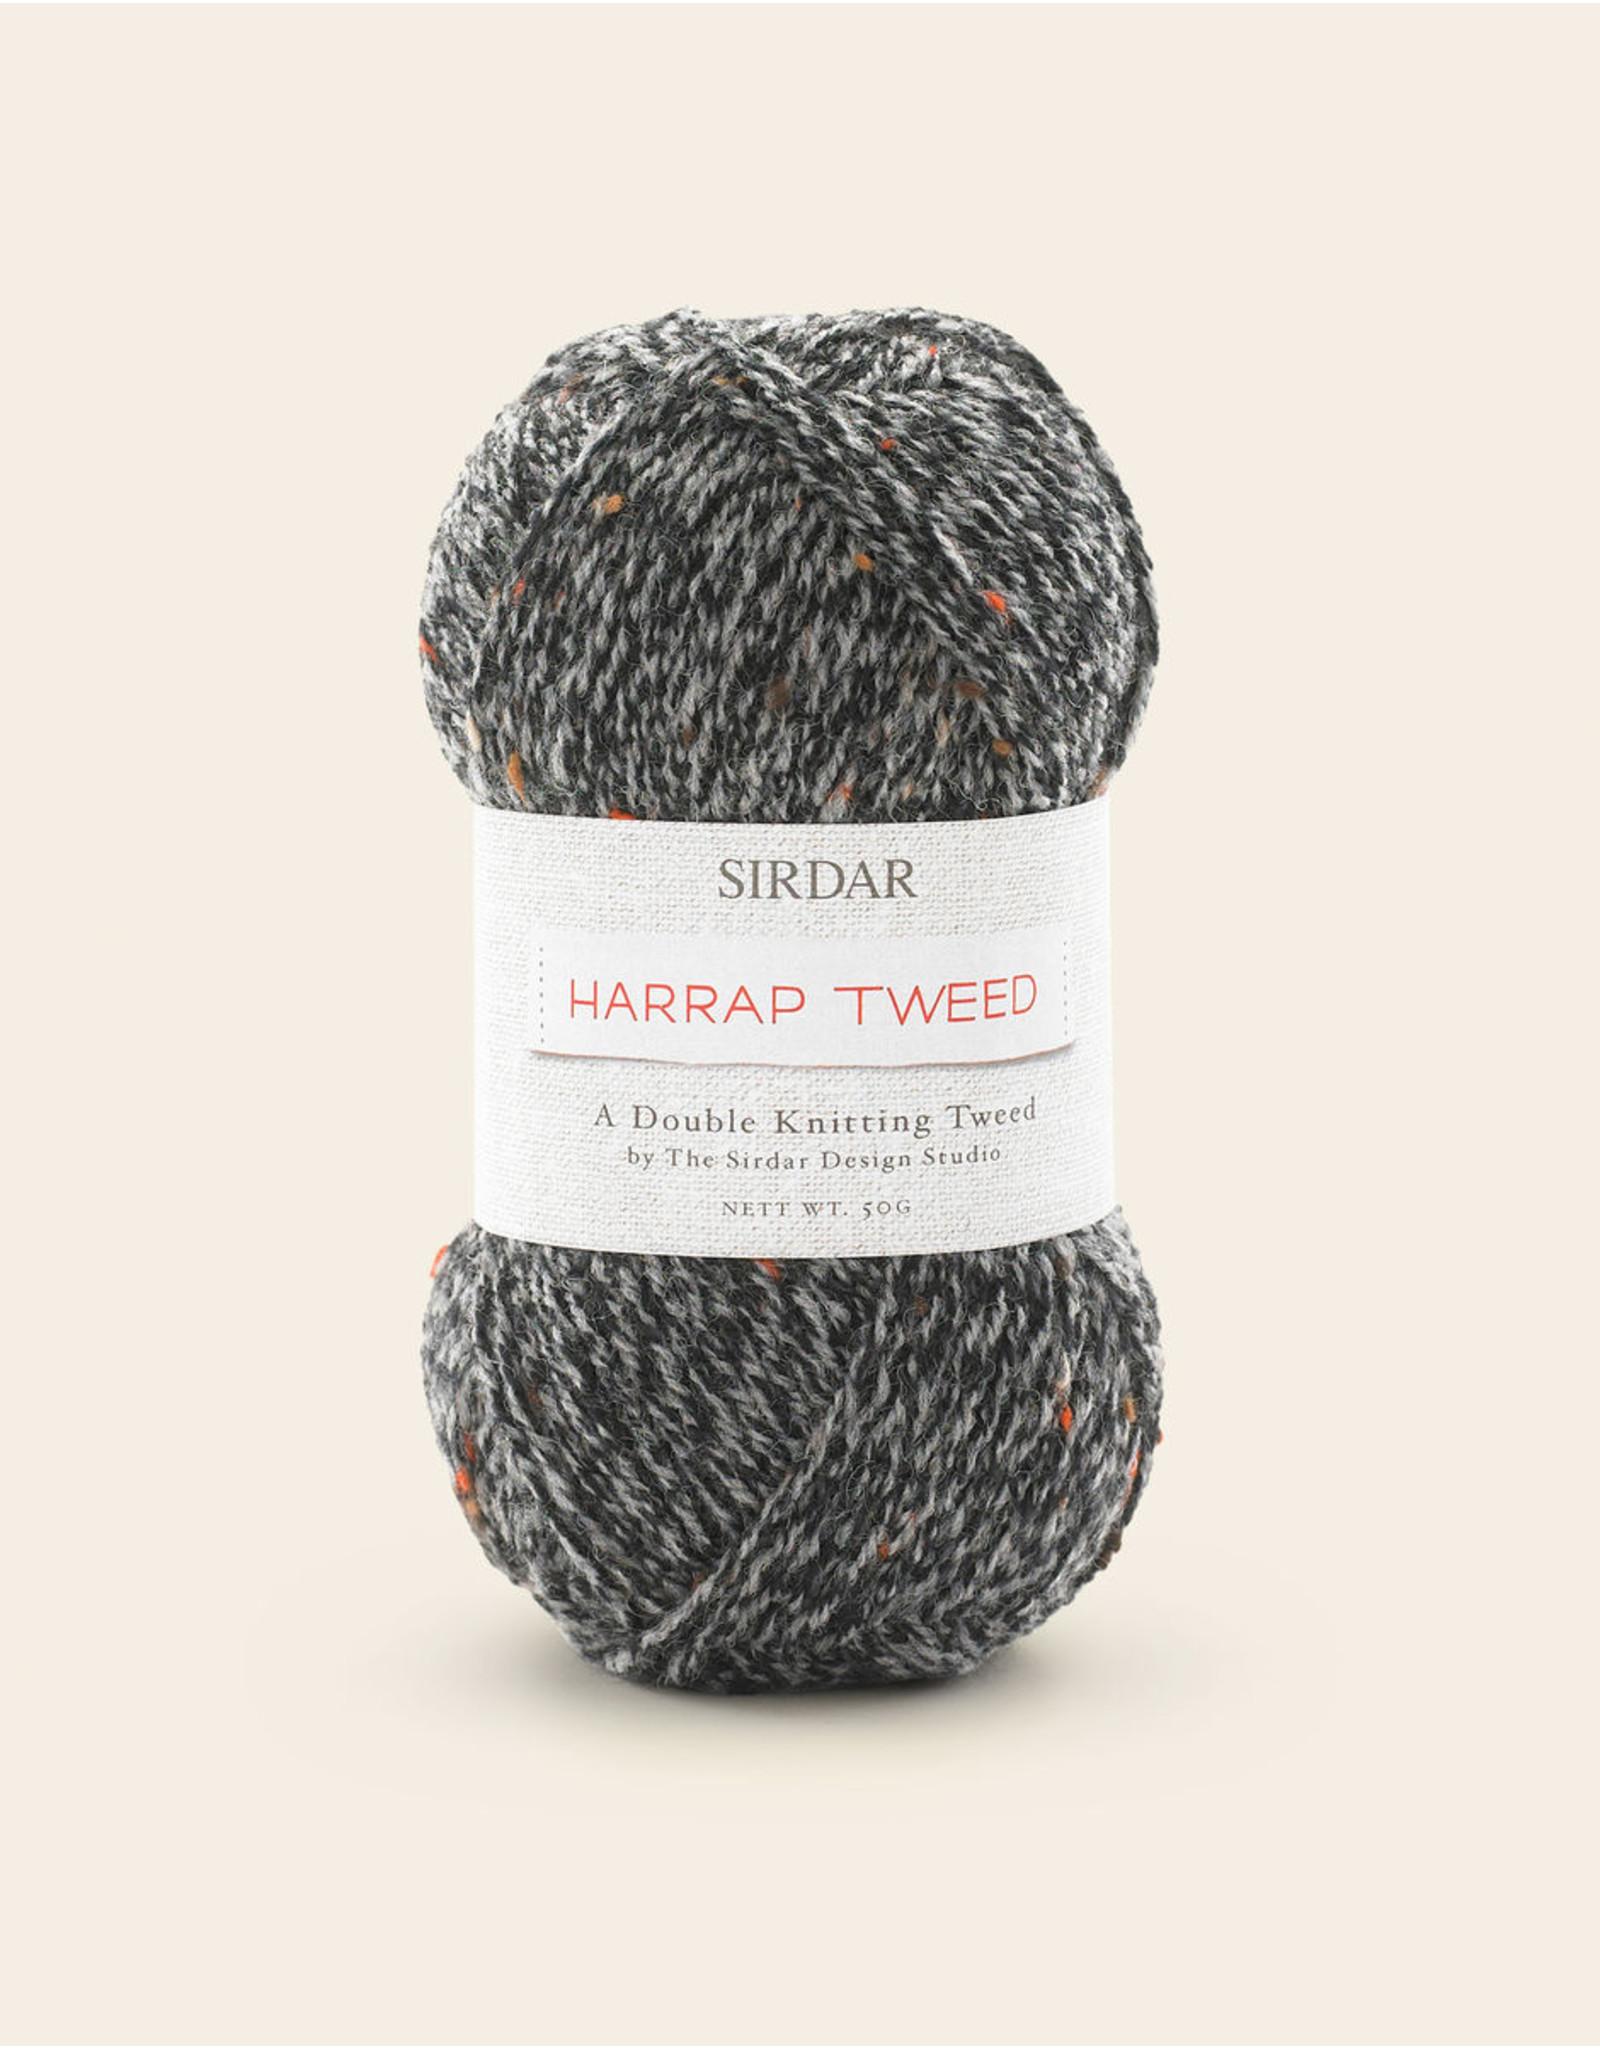 Sirdar Sirdar Harrap Tweed DK